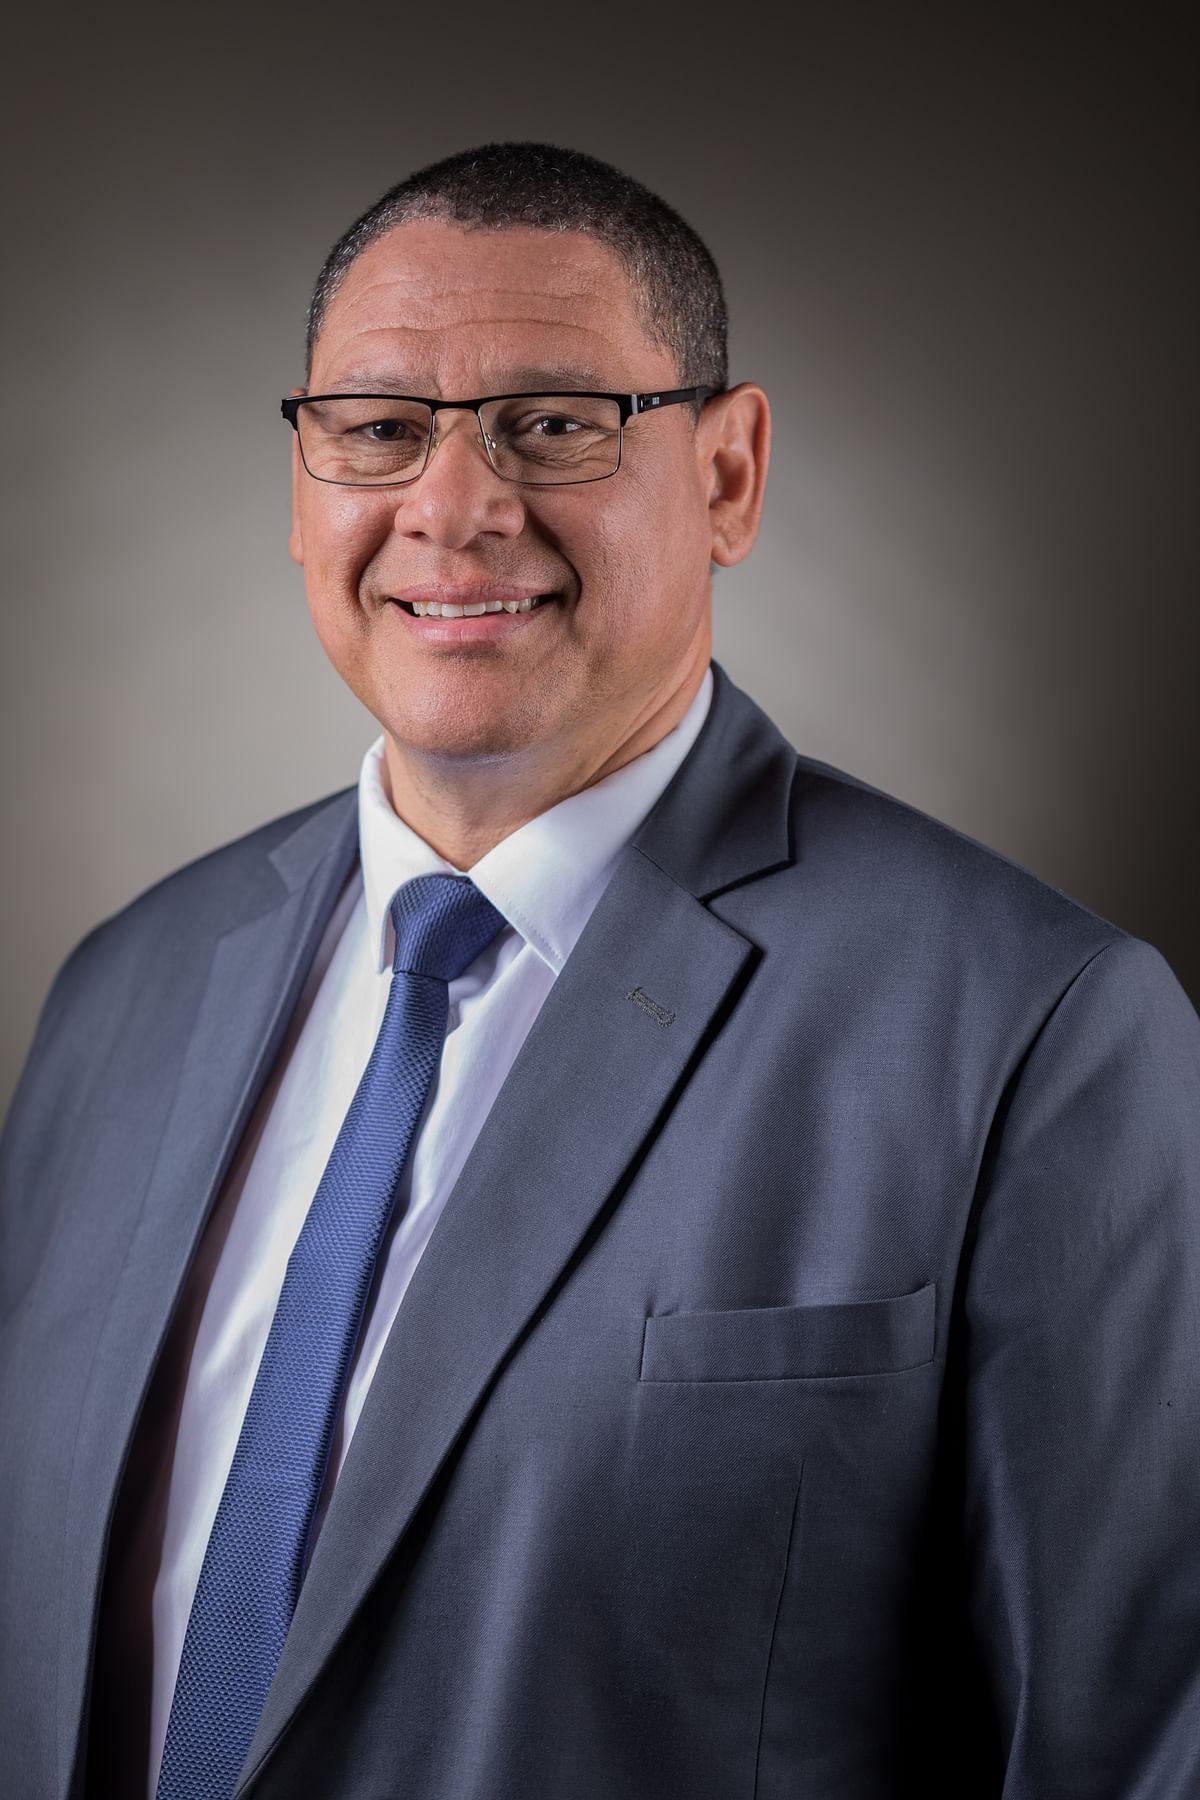 Botswana Life Insurance Limited CEO, Mr. Ronald Samuels